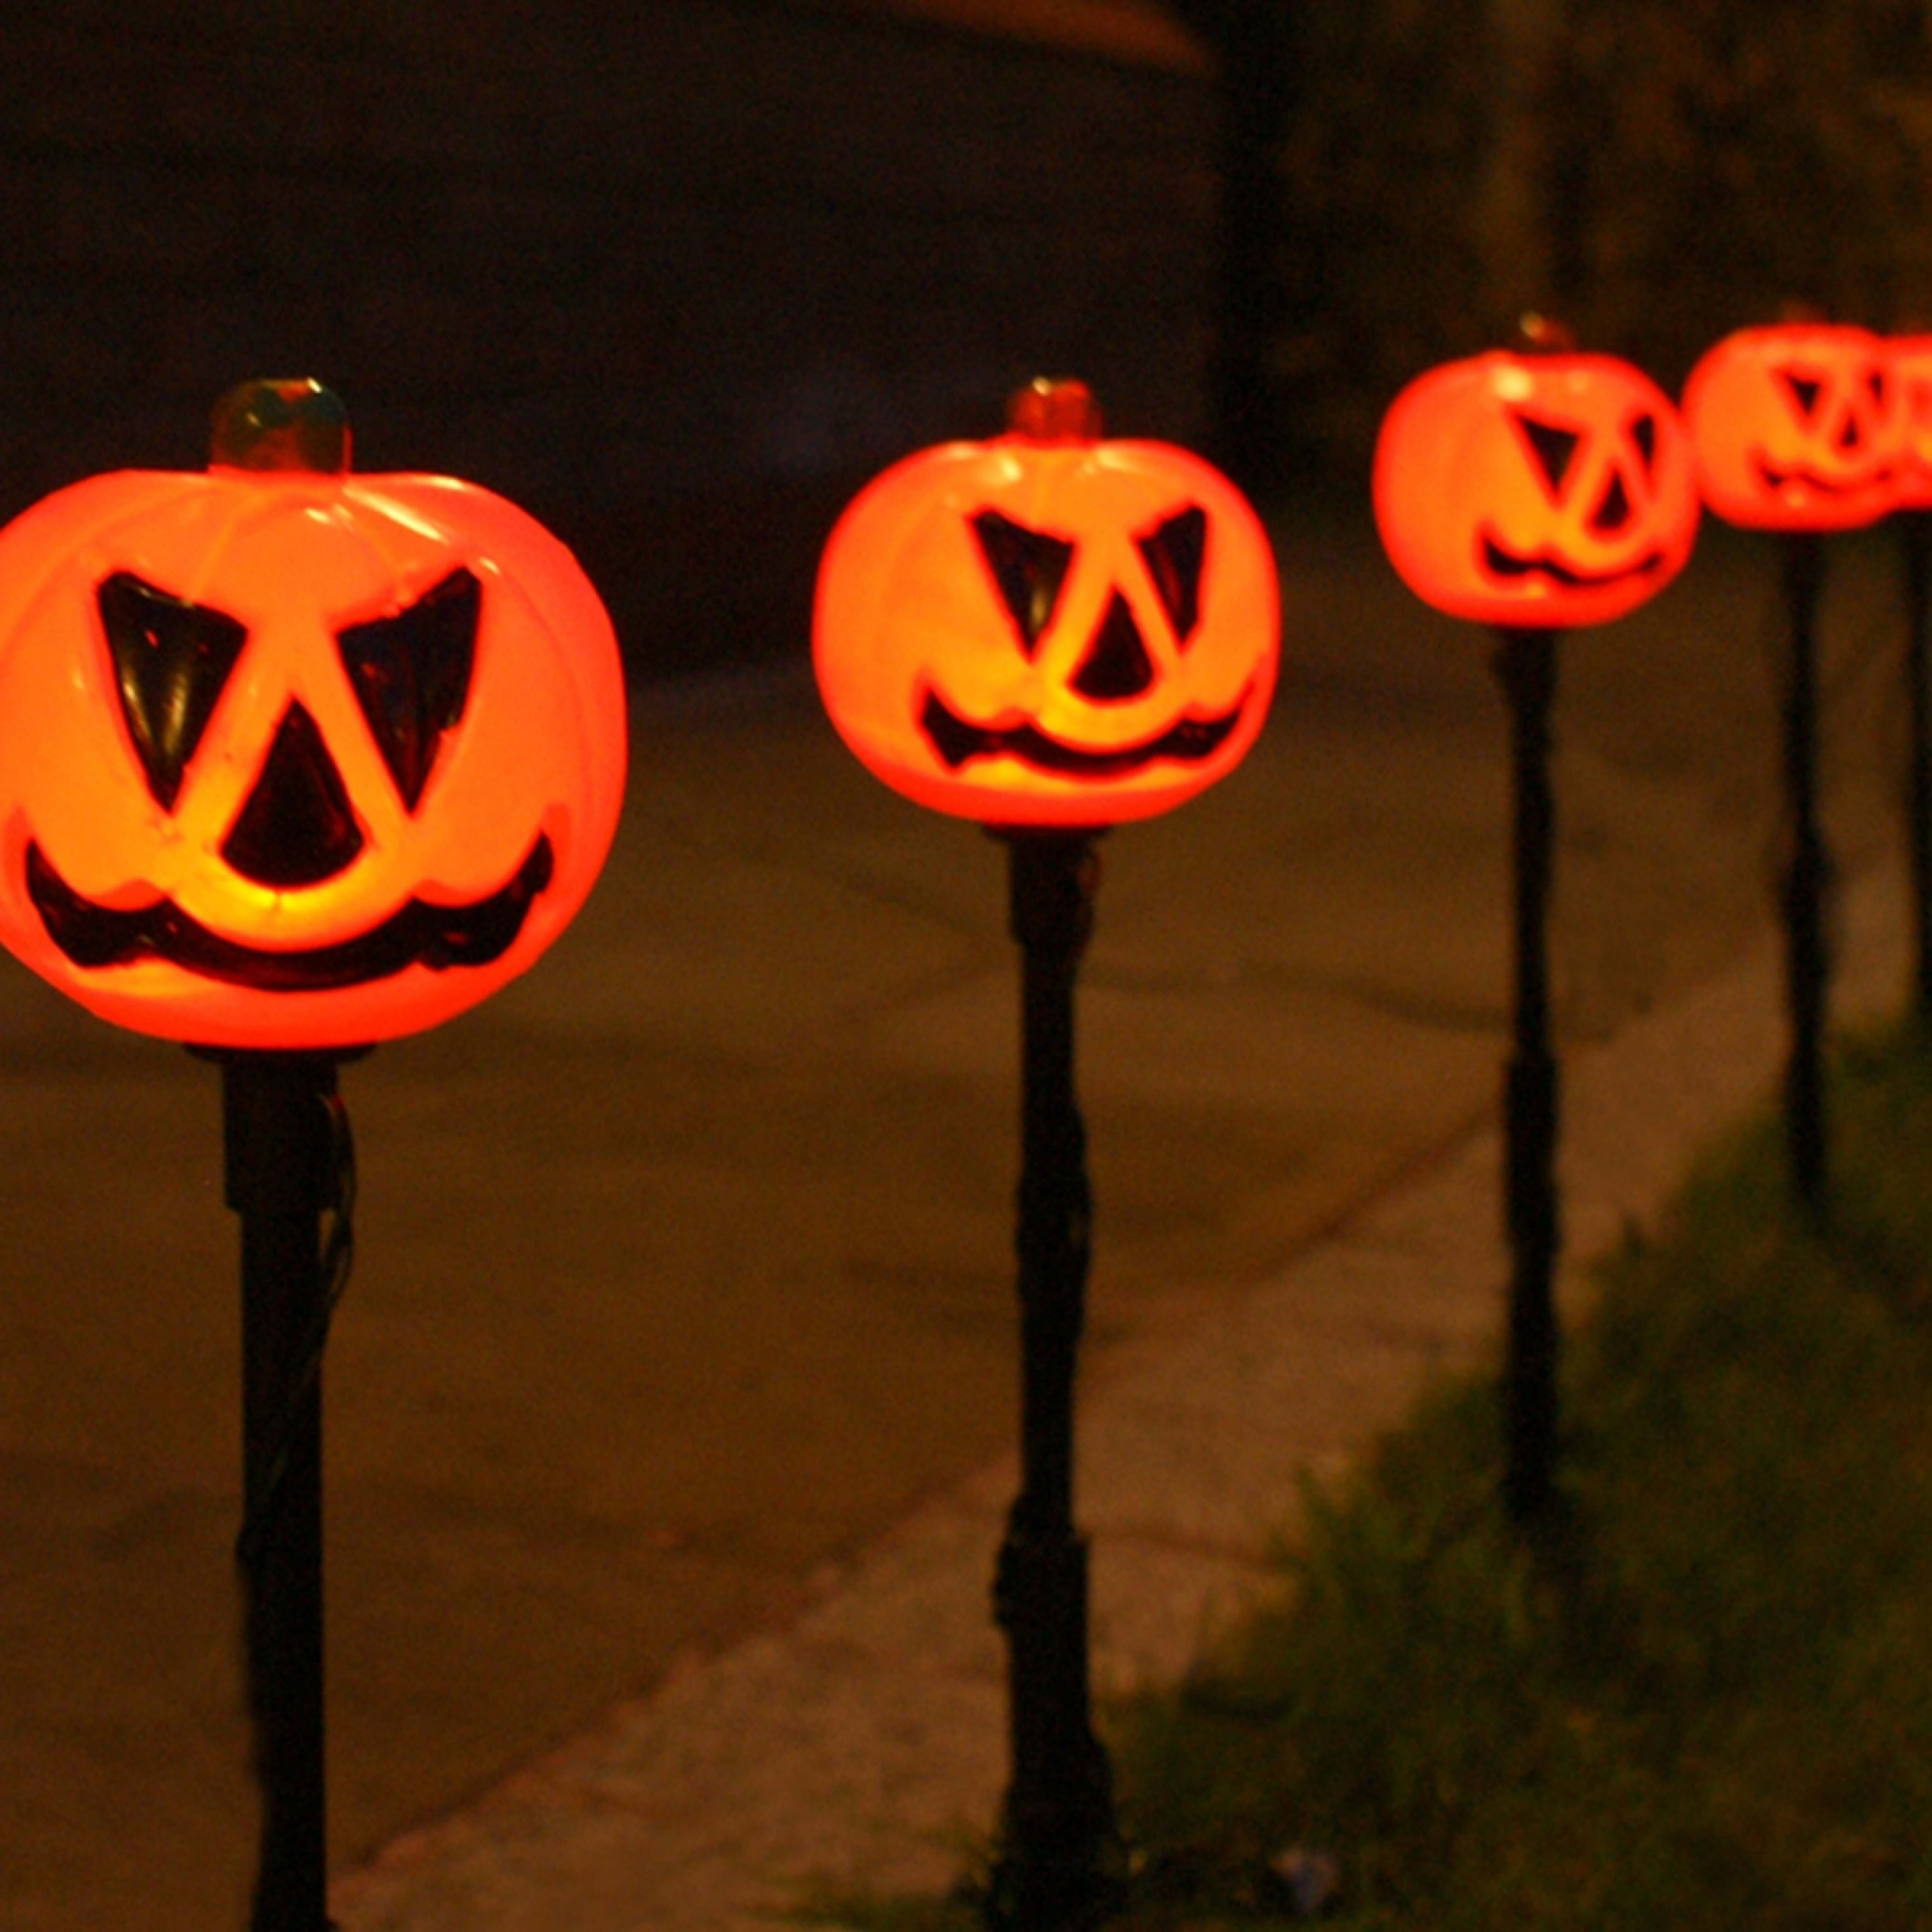 5 Outdoor Halloween Pumpkin Stake Lights, Orange Leds Pertaining To Newest Outdoor Pumpkin Lanterns (View 5 of 20)